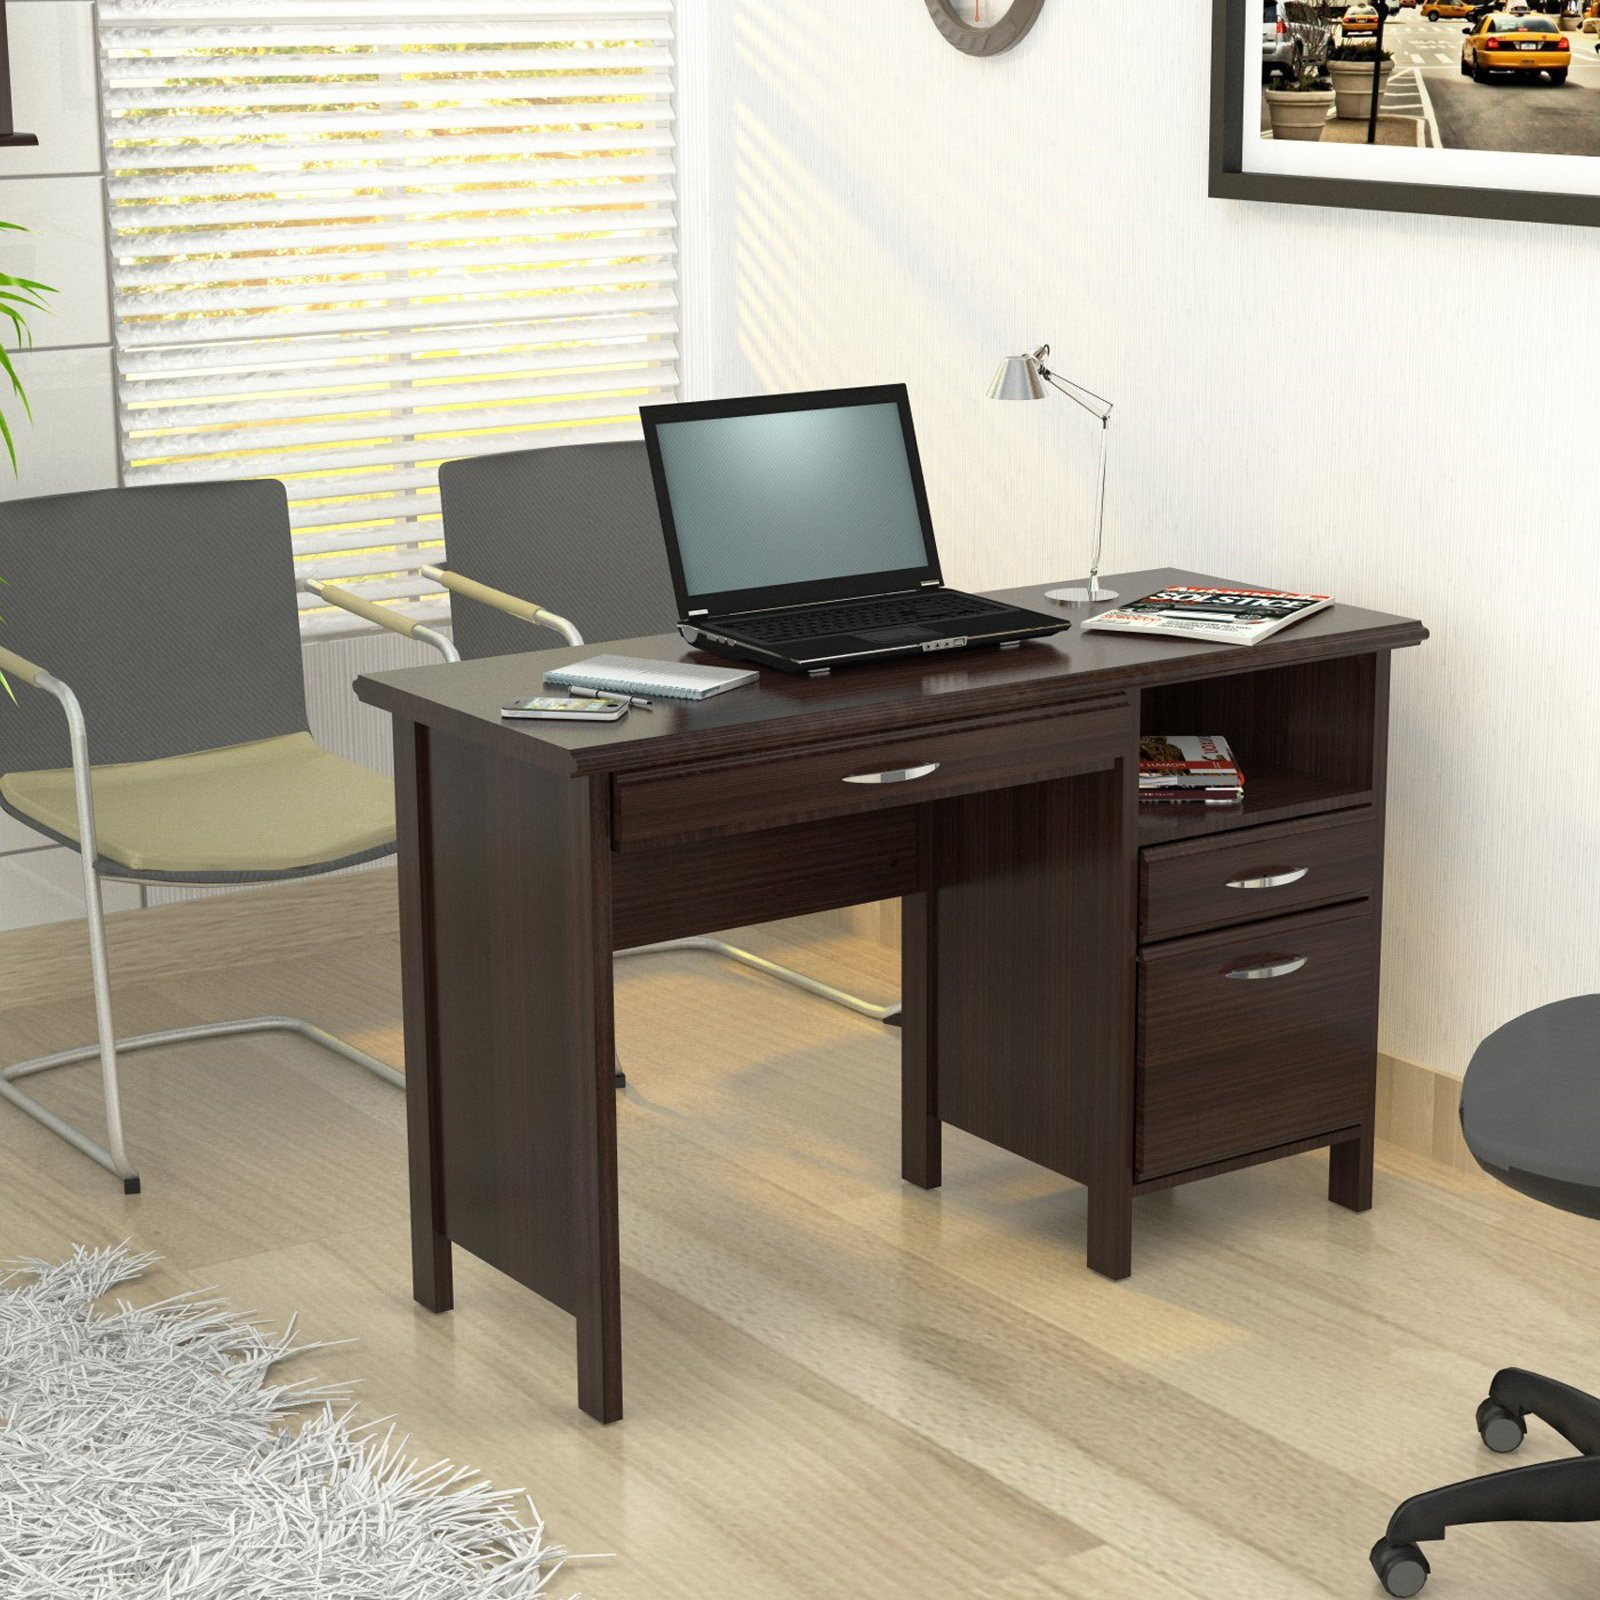 Inval Softform Computer Desk Espresso Wengue Finish